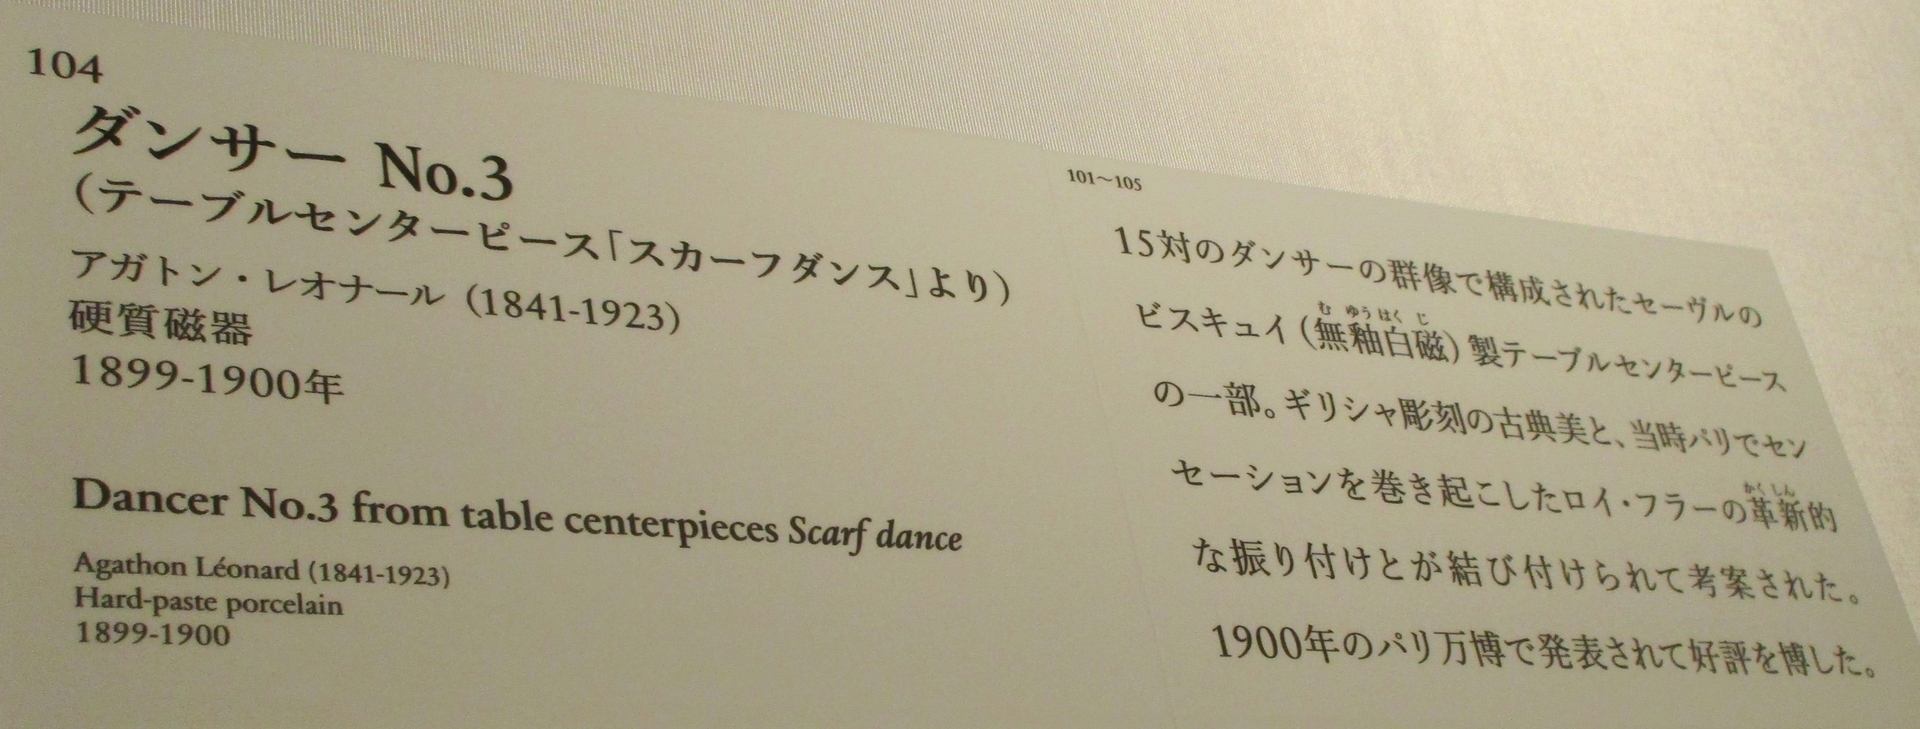 IMG_3629.JPG